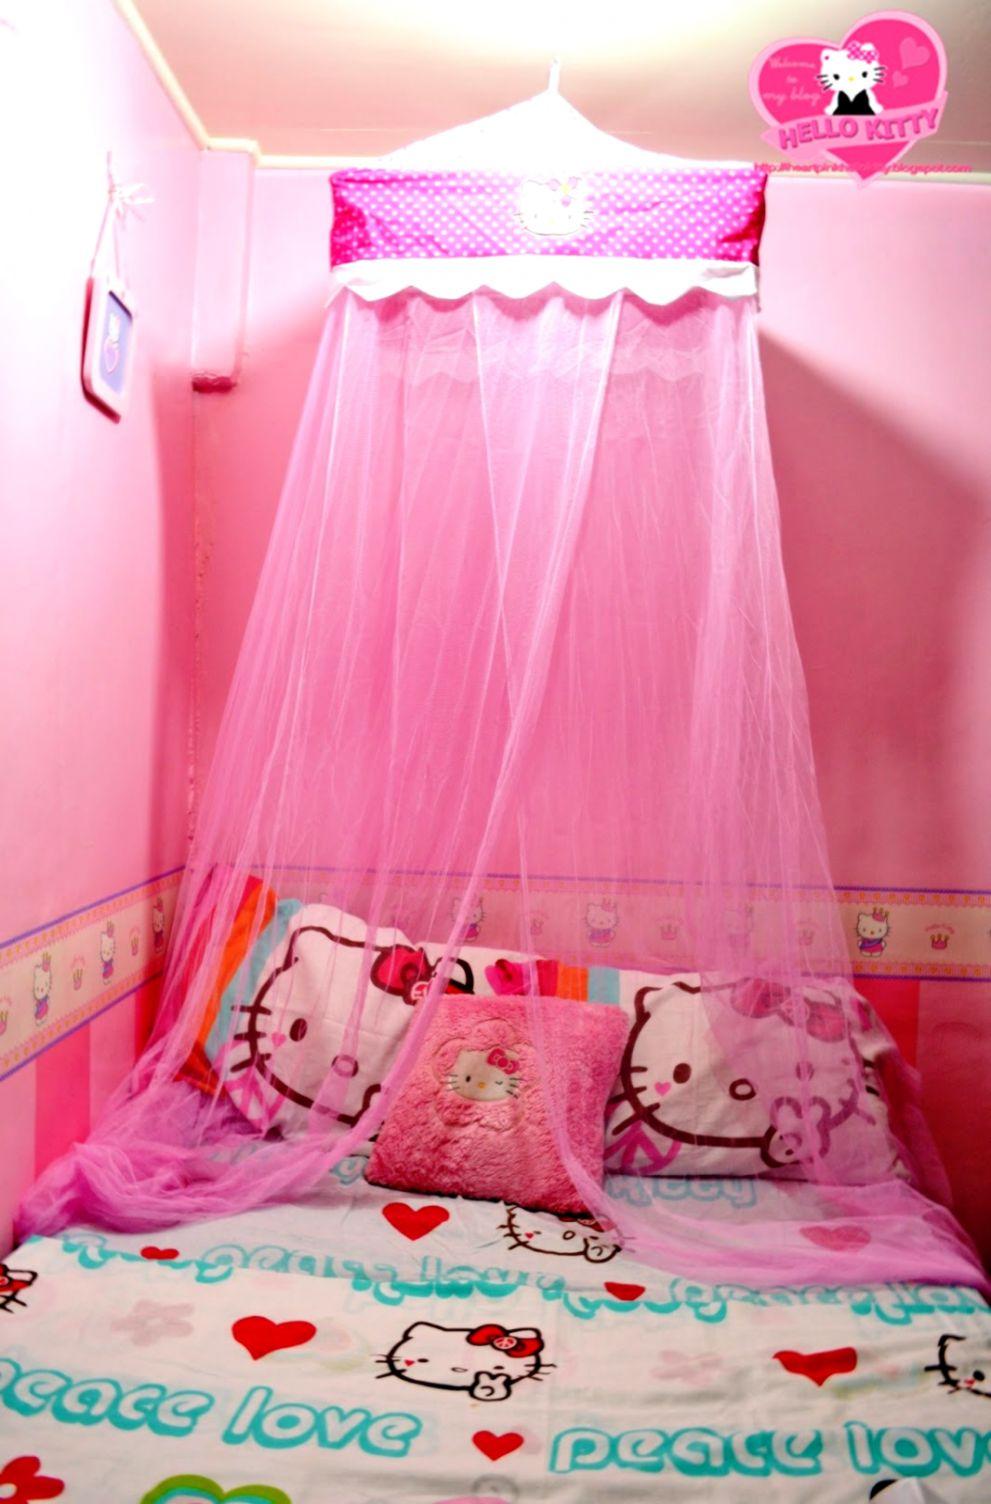 Hello Kitty Wallpaper For Bedroom